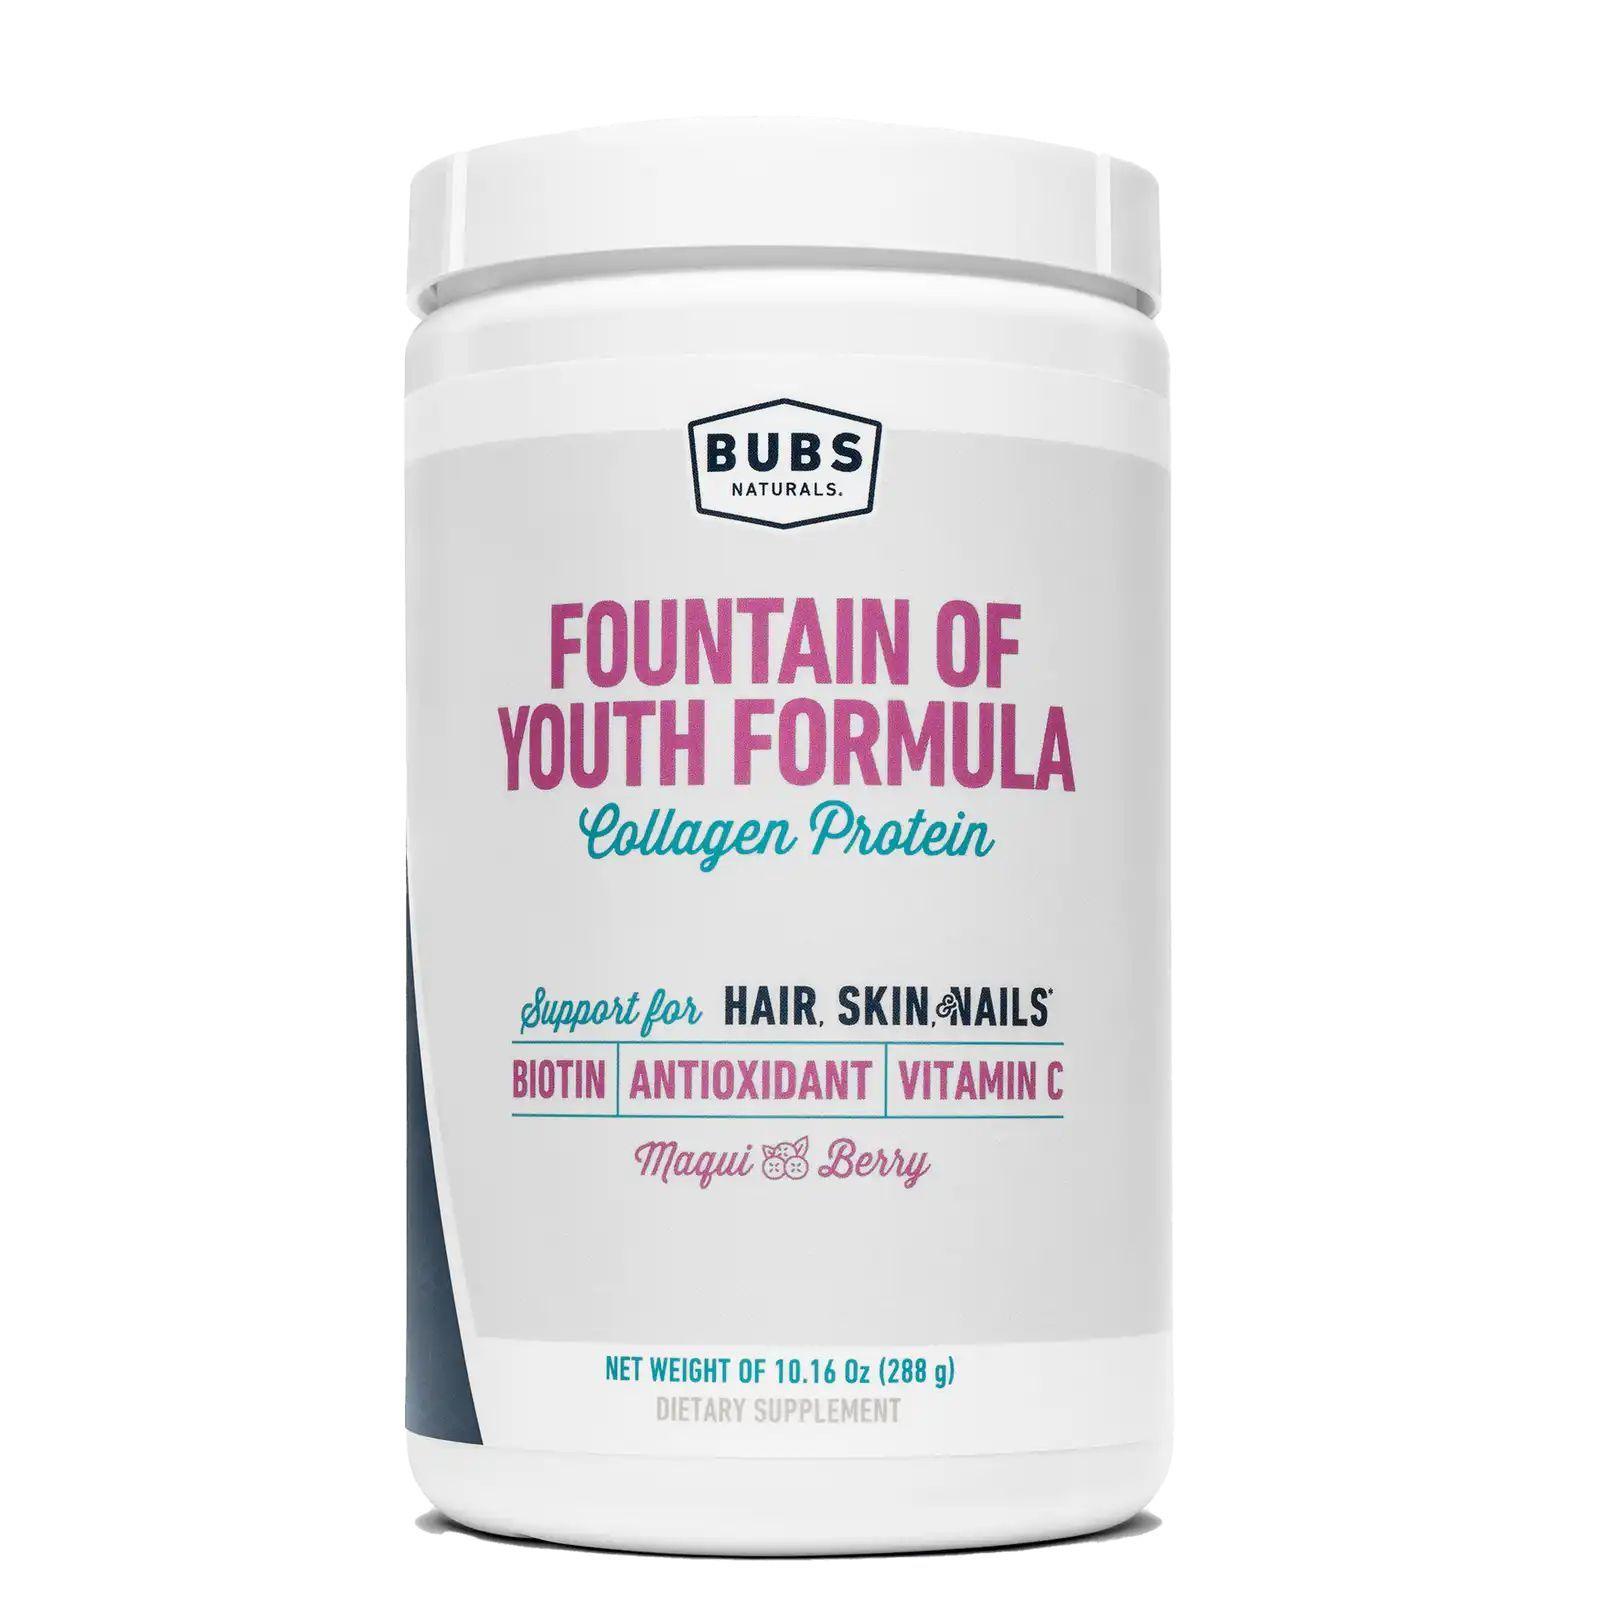 Комплекс коллагена с антиоксидантами, Fountain of Youth Formula, Bubs Naturals (288 g)